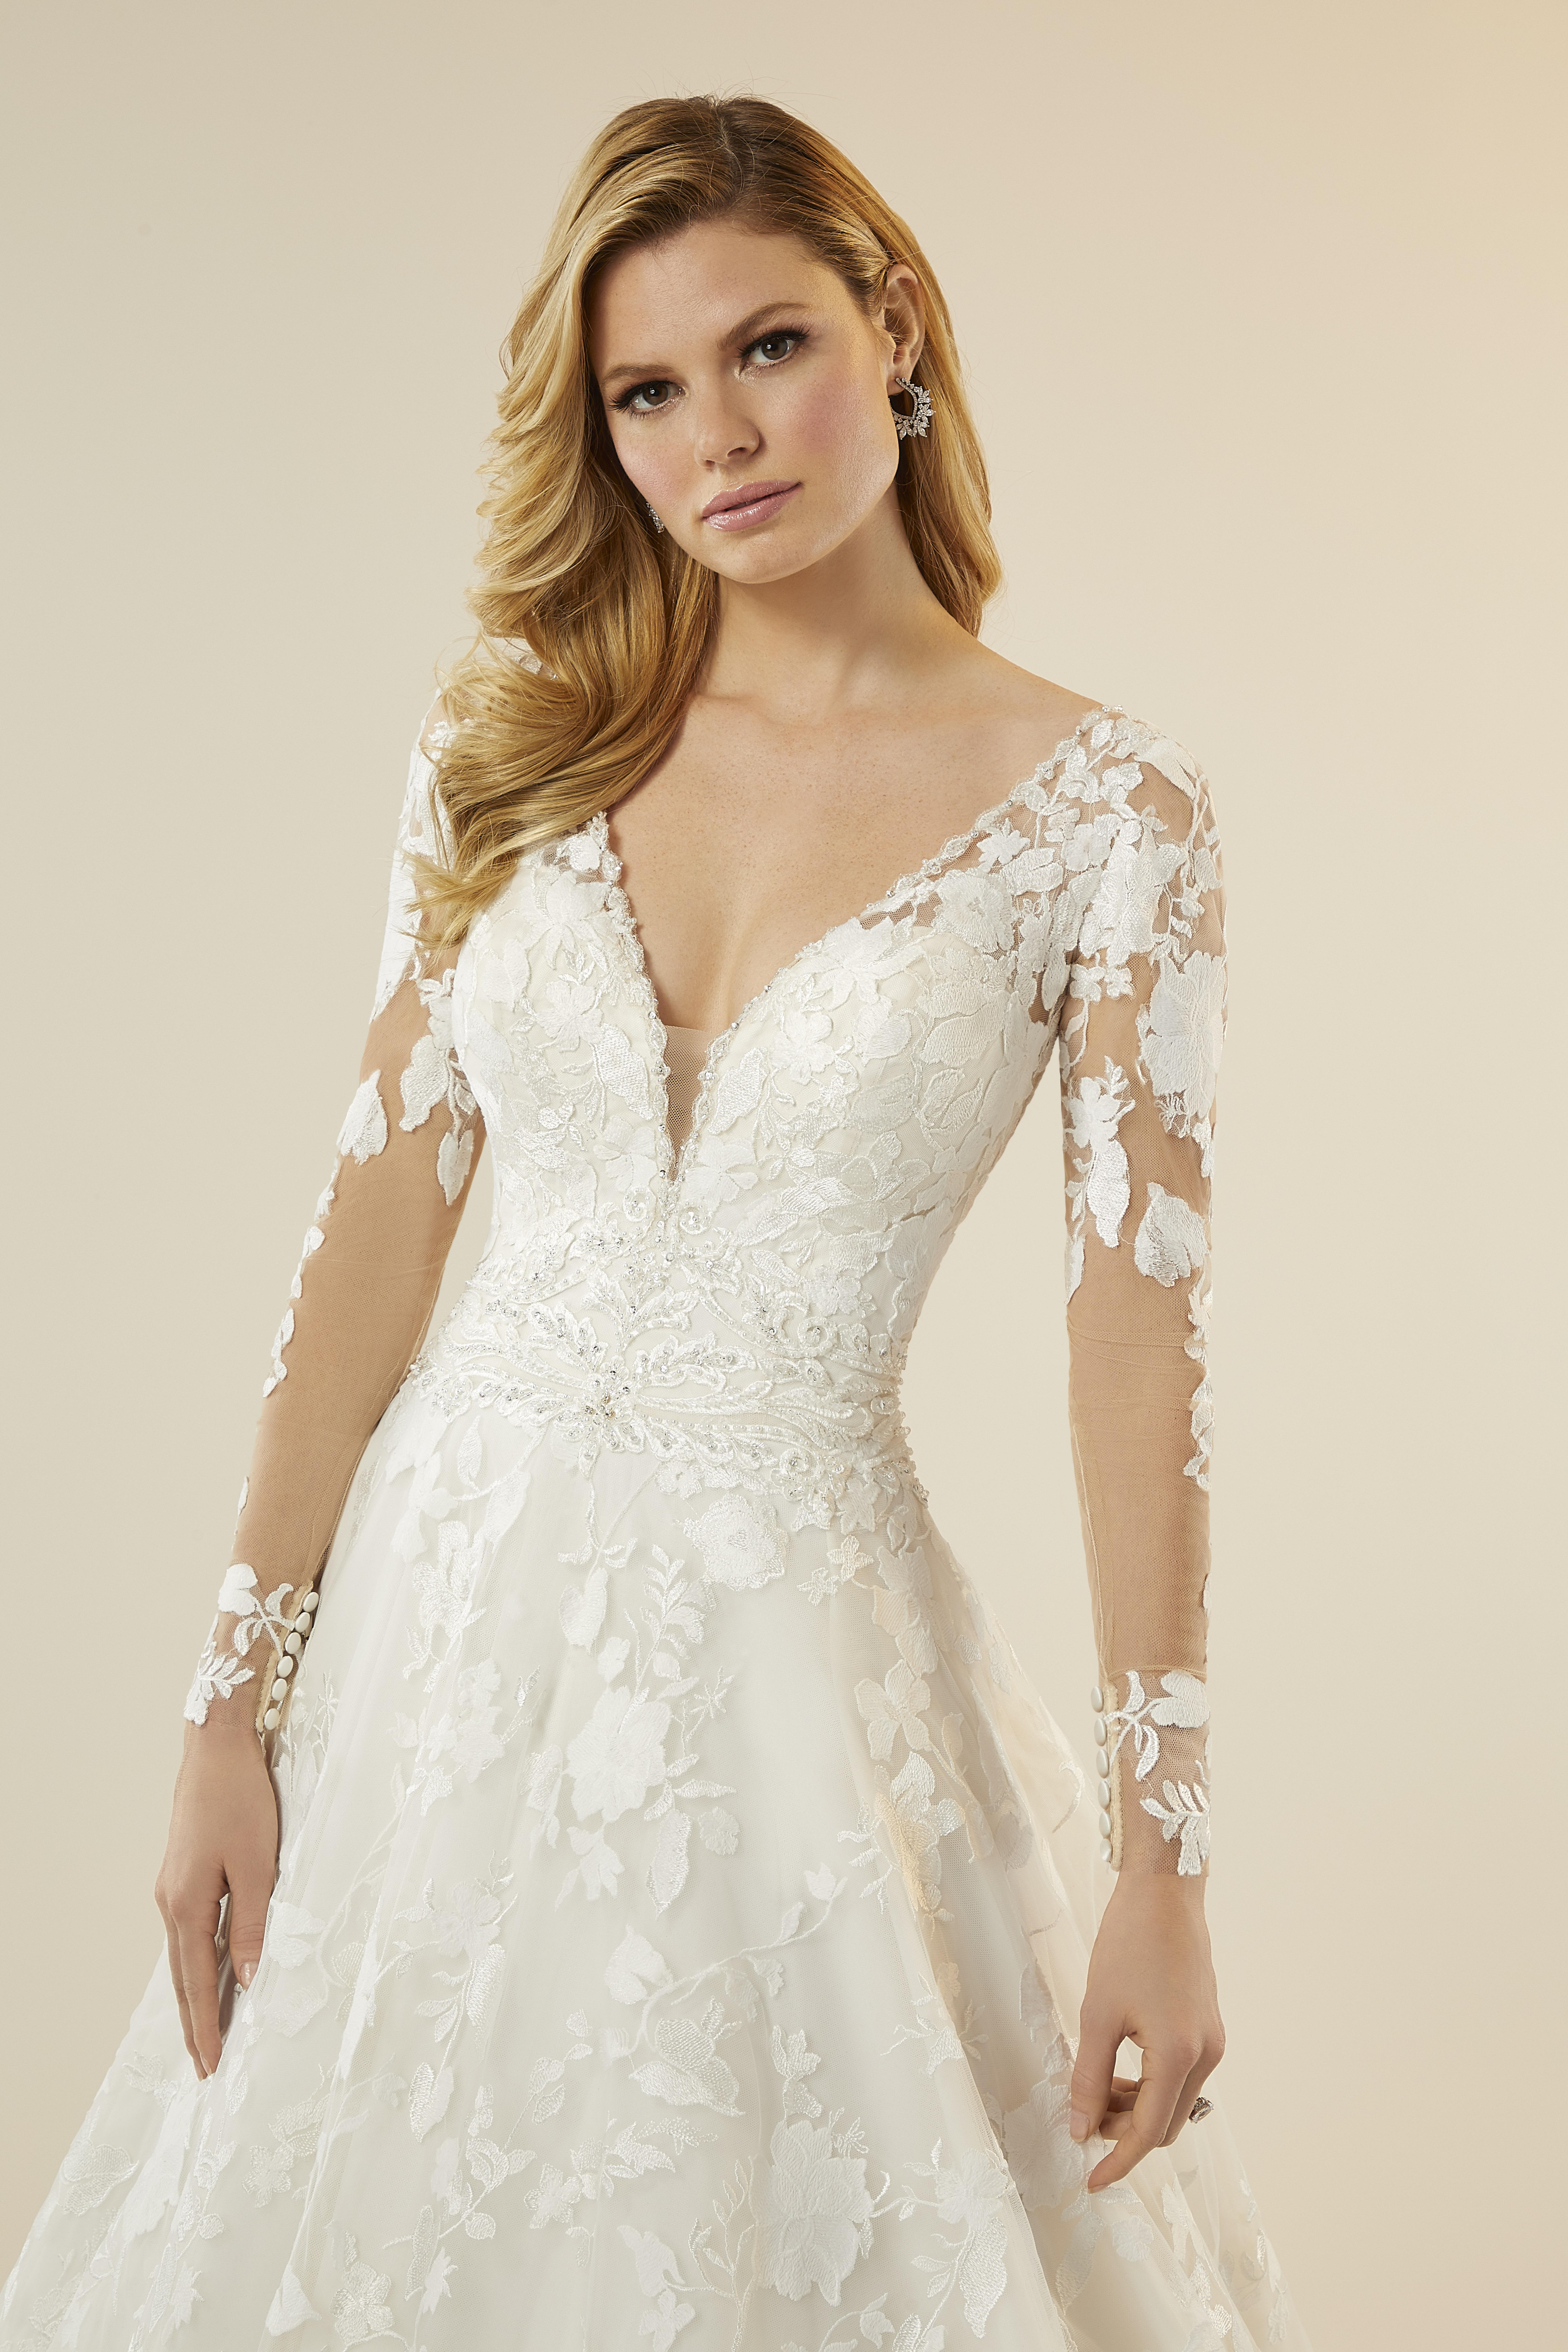 Madeline-Gardner-New-York-51705-wedding-dress-melody